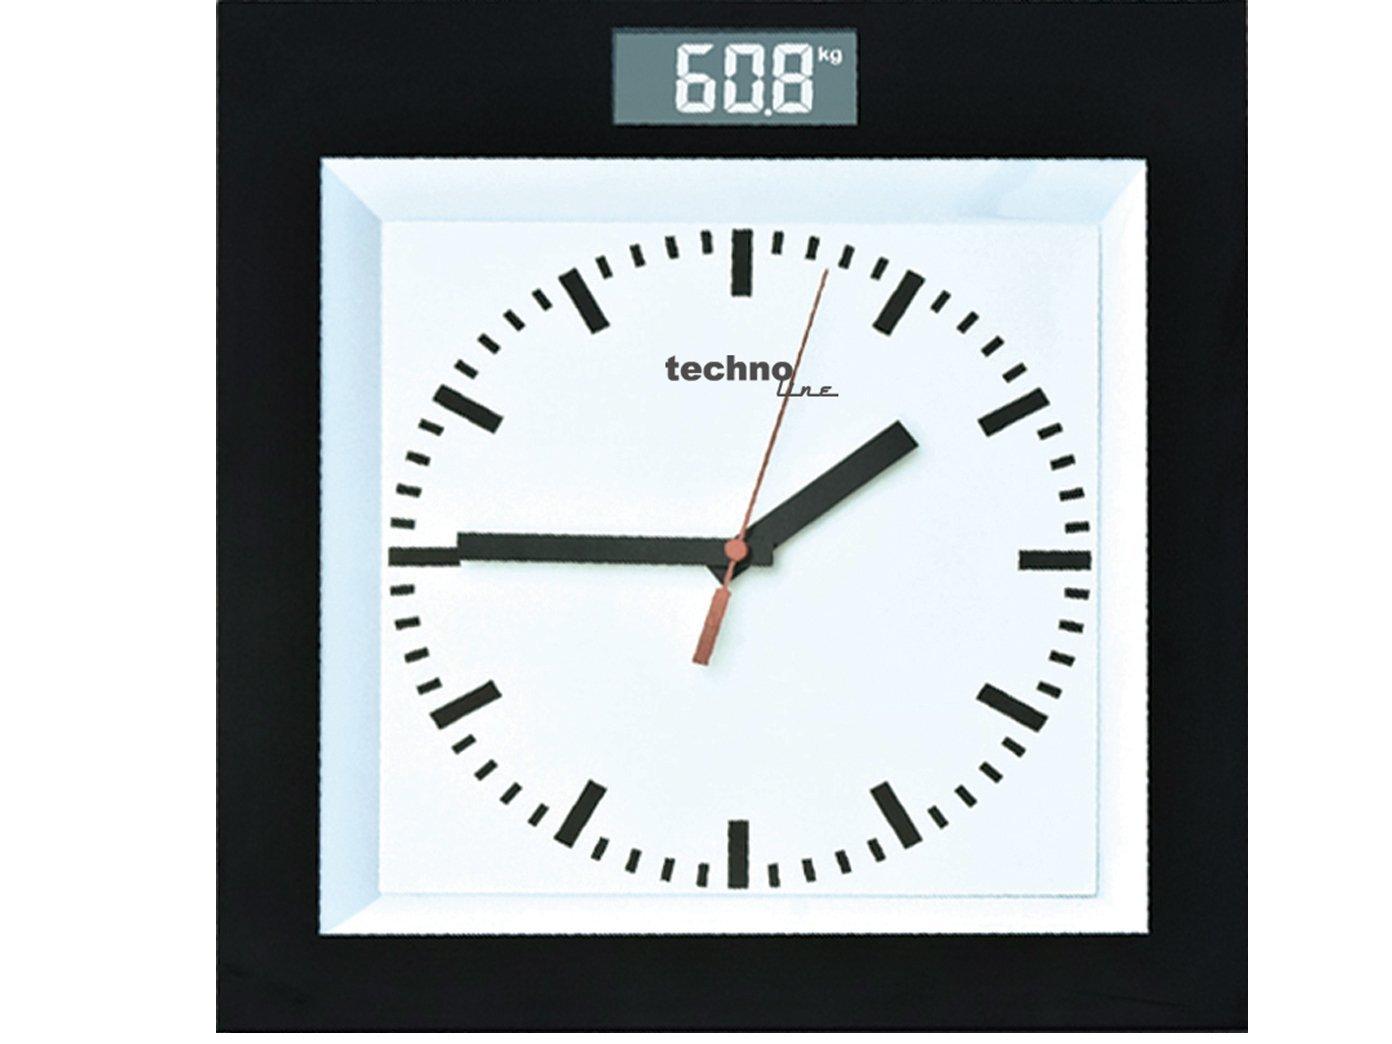 Technoline PW 300 P/èse Baggage 4,9 x 30 x 32 cm